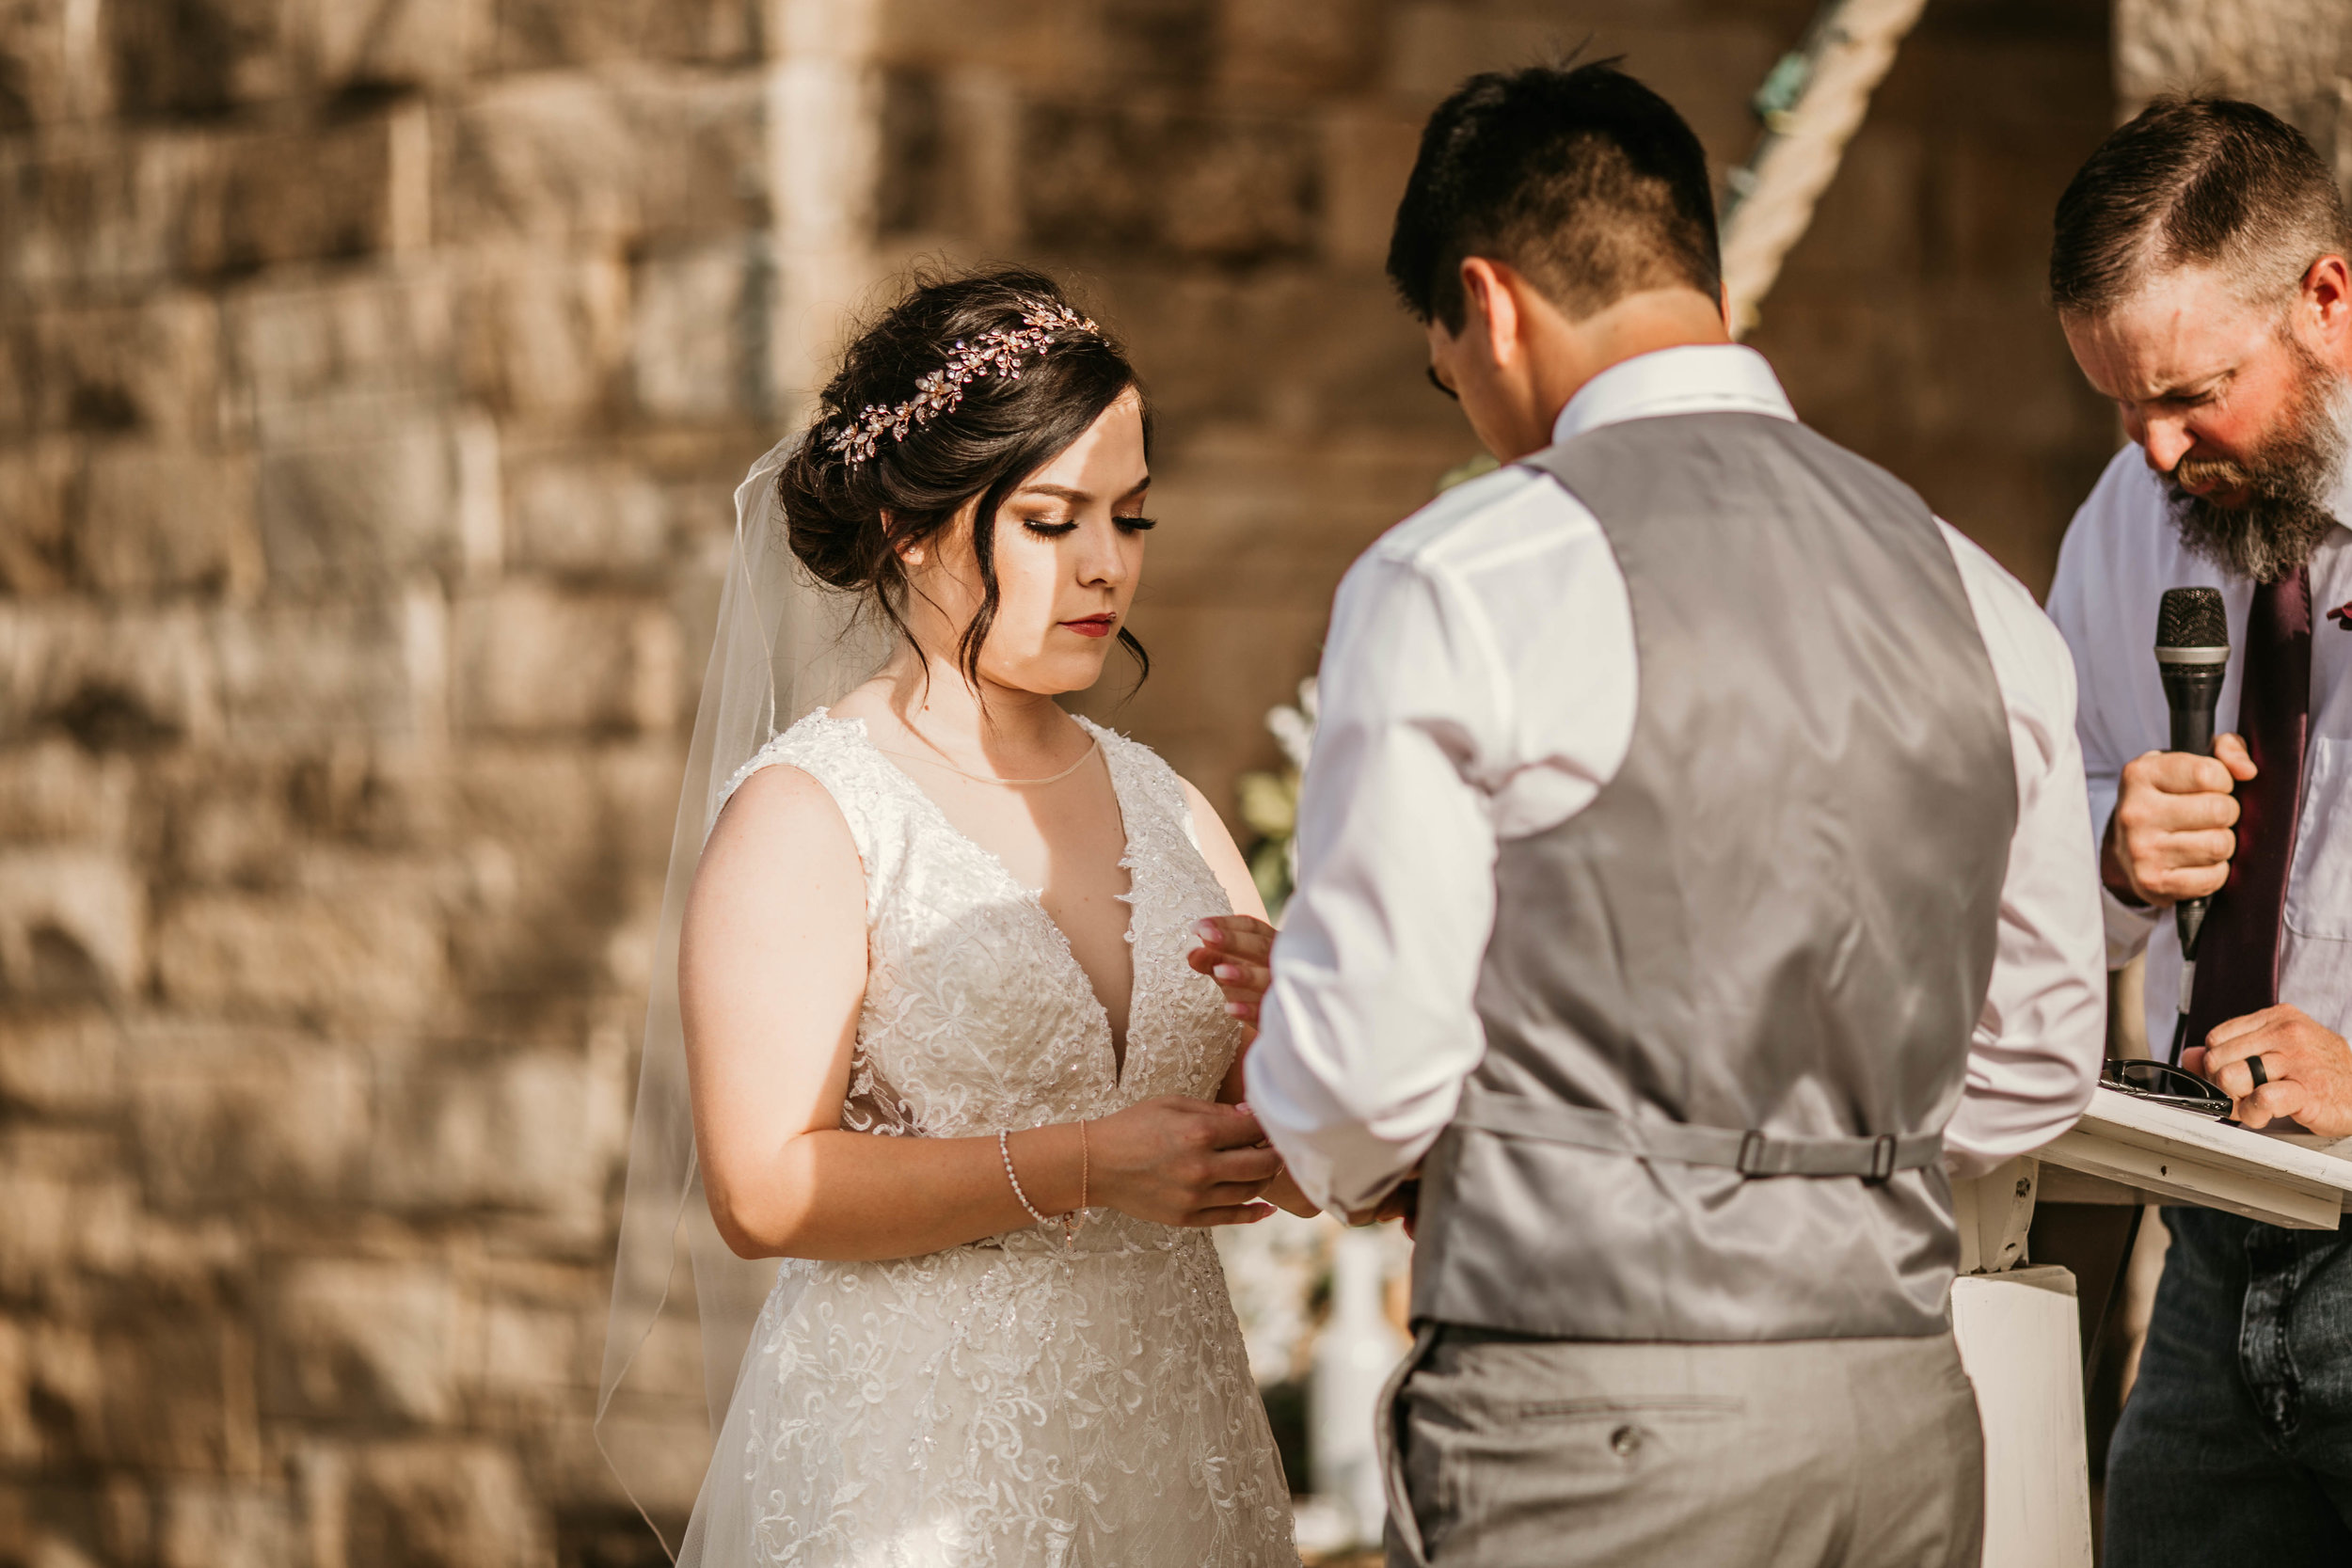 Lubbock,Texas Wedding_MG_0296-2.jpg